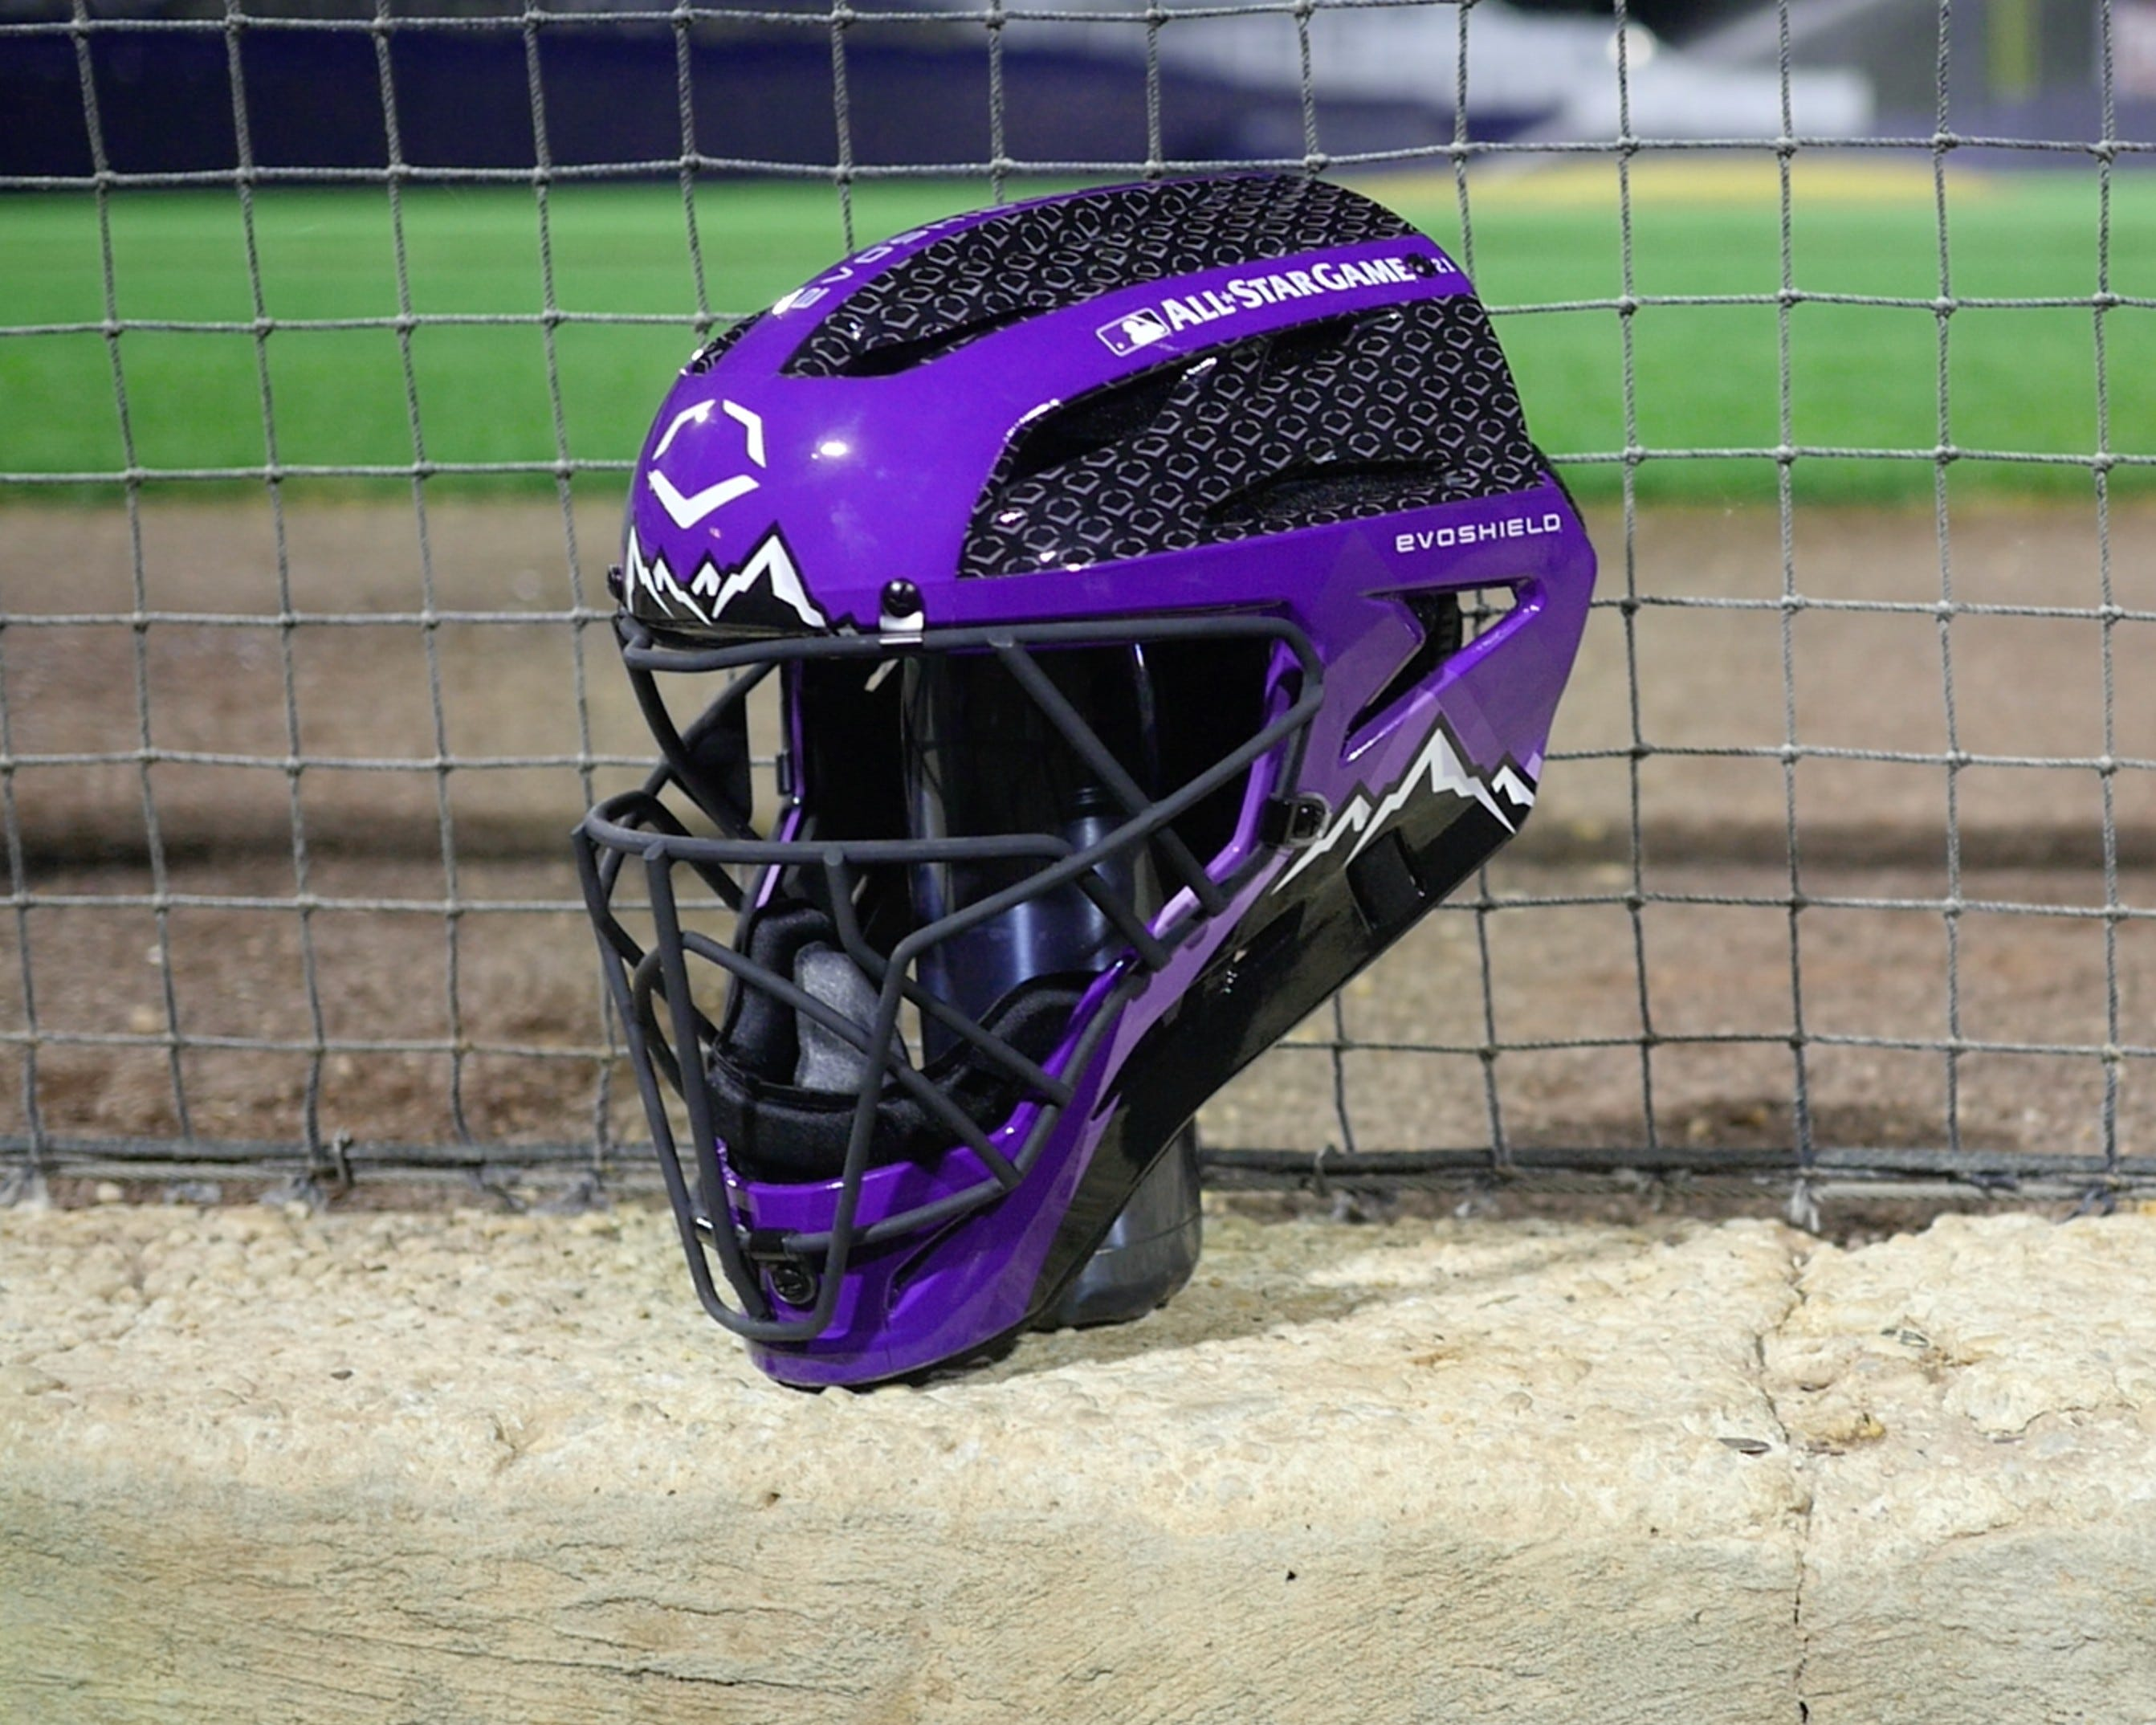 EvoShield-Catchers-Gear-Pro-SRZ-Home-Run-Derby-Helmet-All-Star-Game